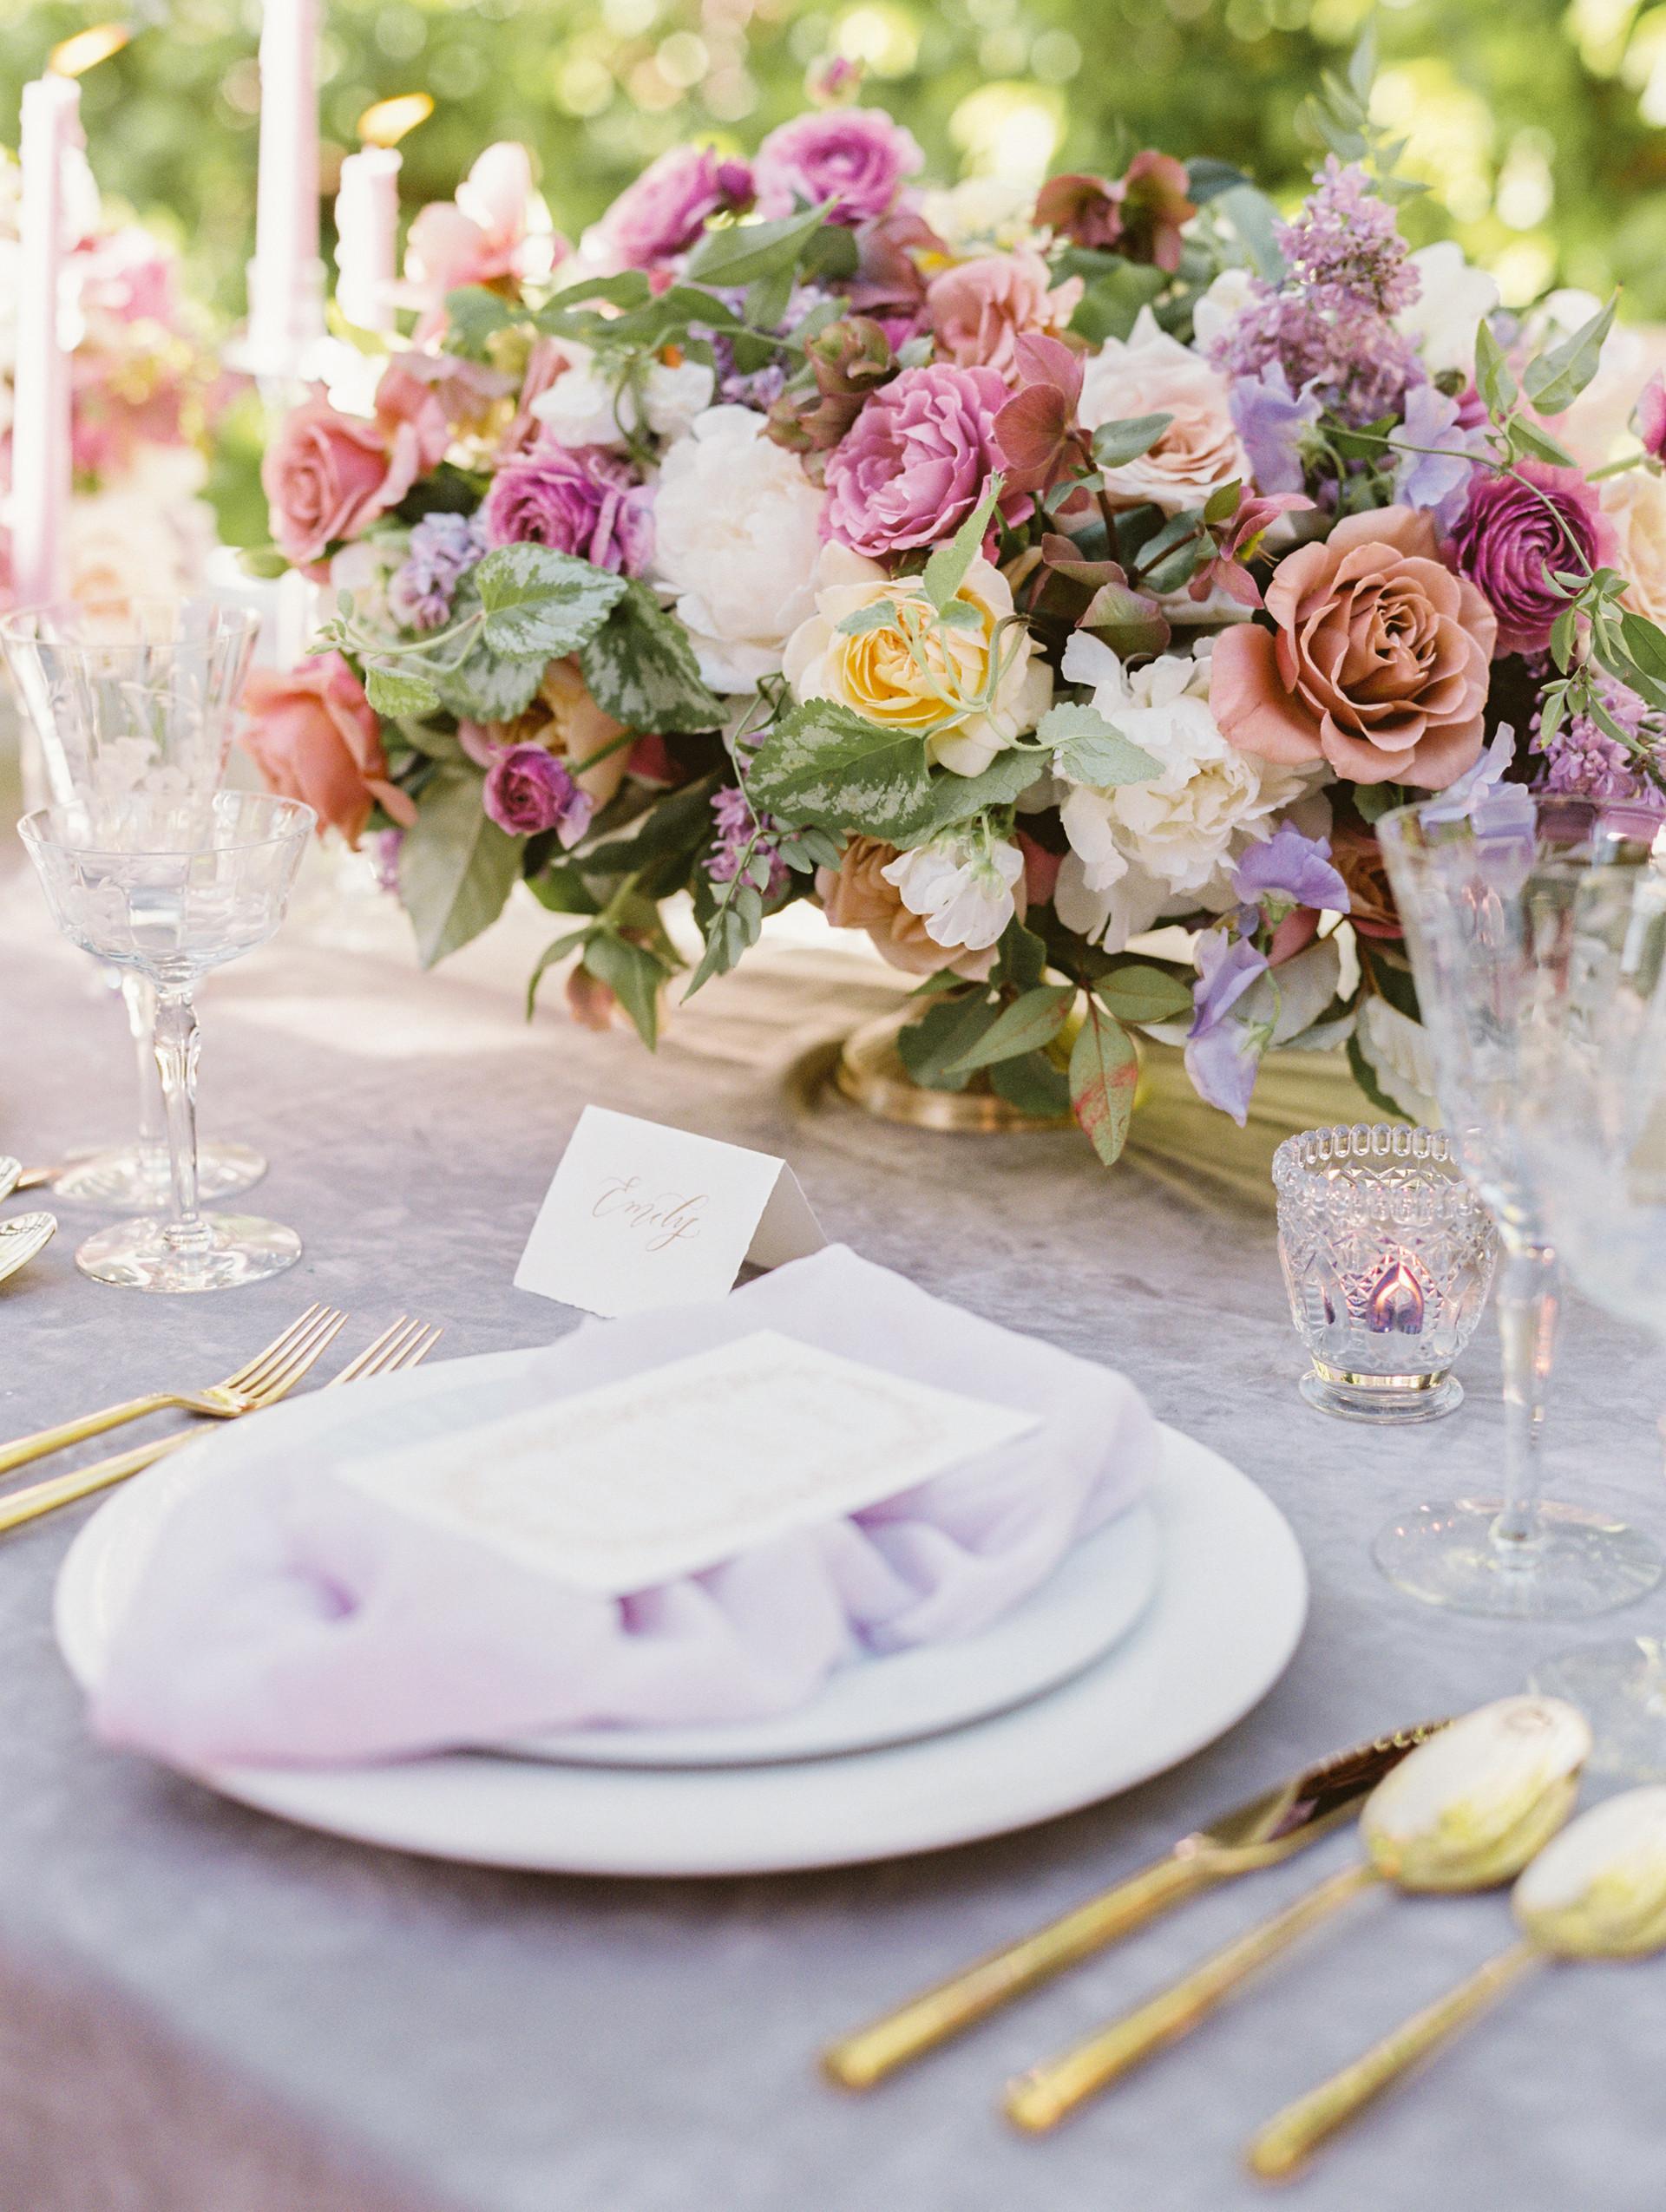 SPRING WEDDING CENTERPIECE. PHOTO: GABY JETER